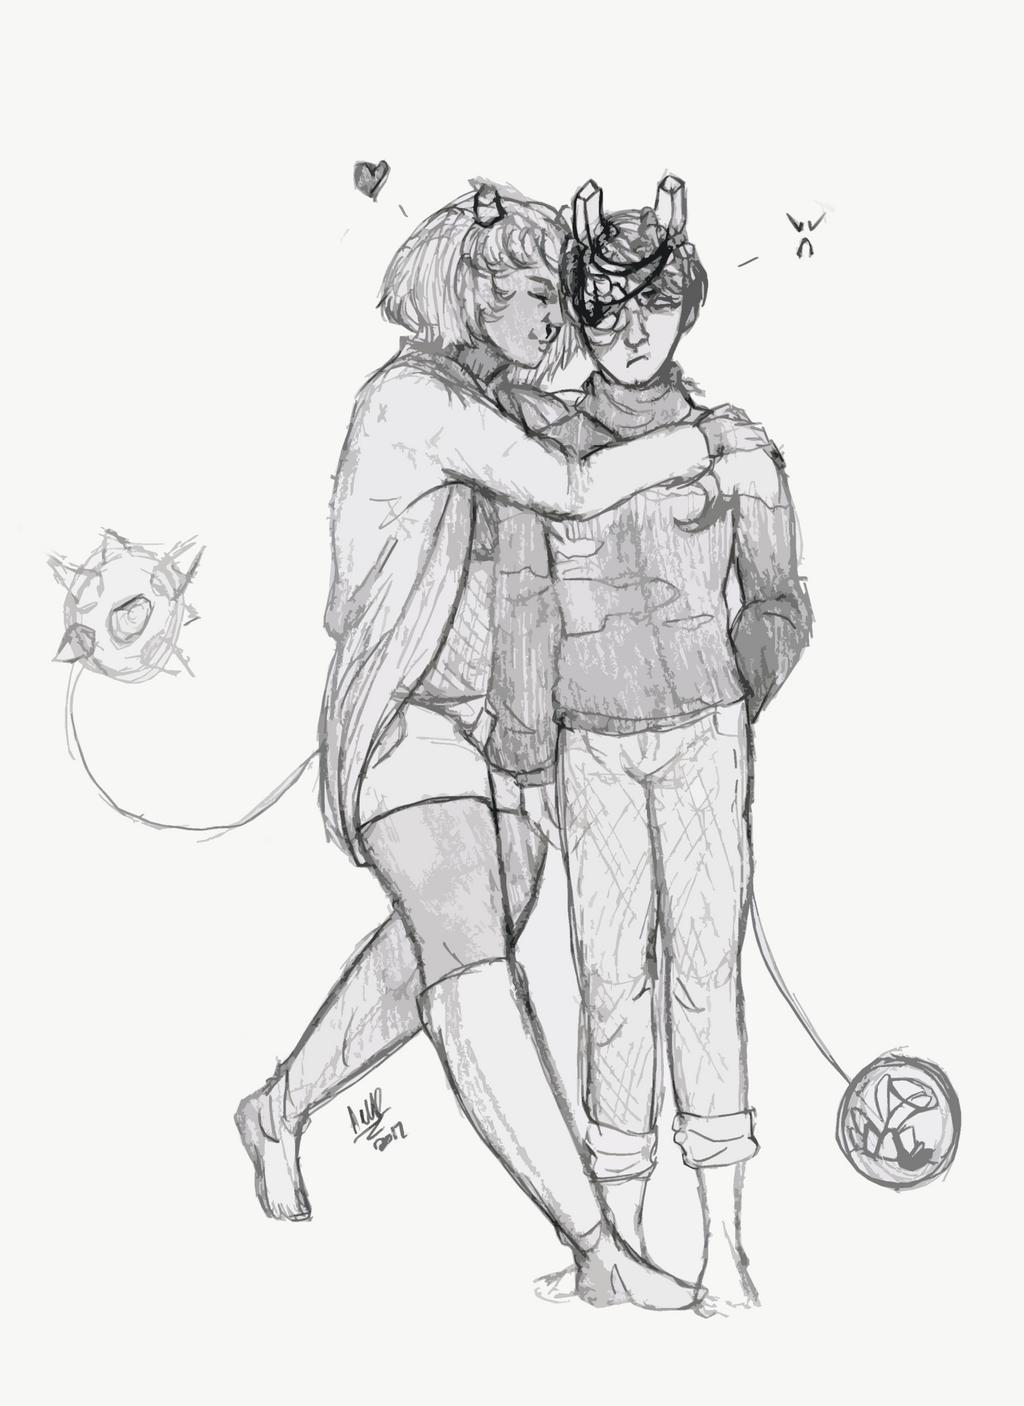 Small Hugs by Qu-Ross